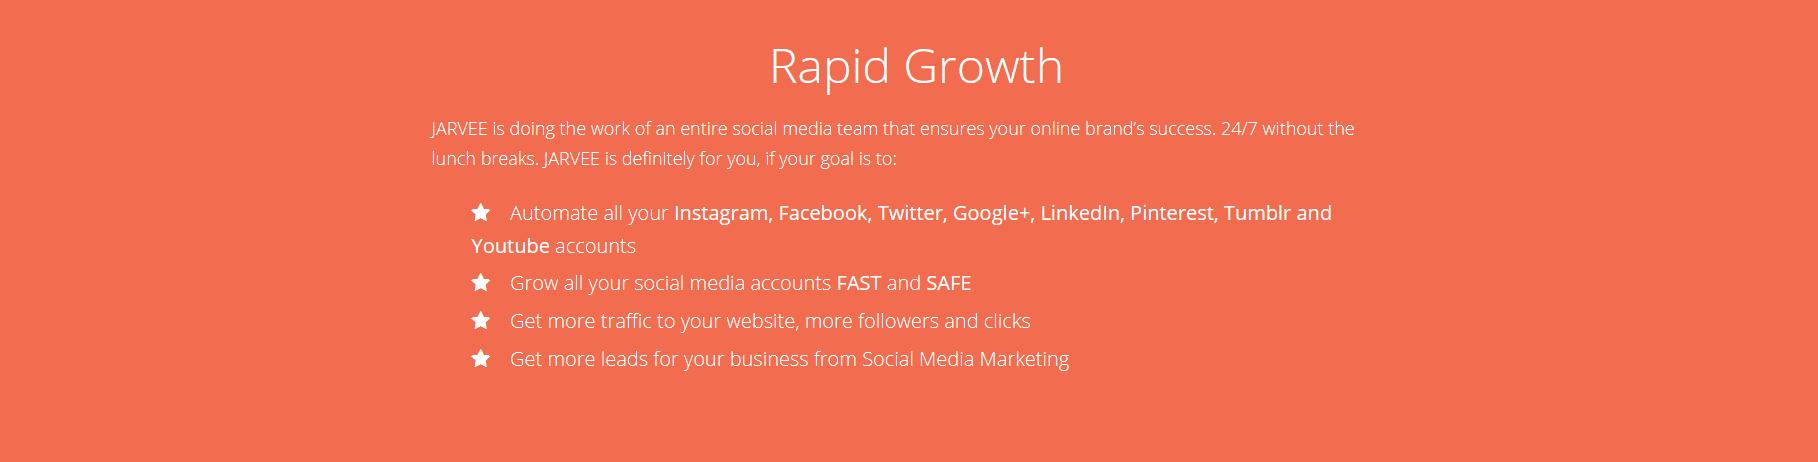 Guida Jarvee Bot: scopri come aumentare i follower gratis su Instagram